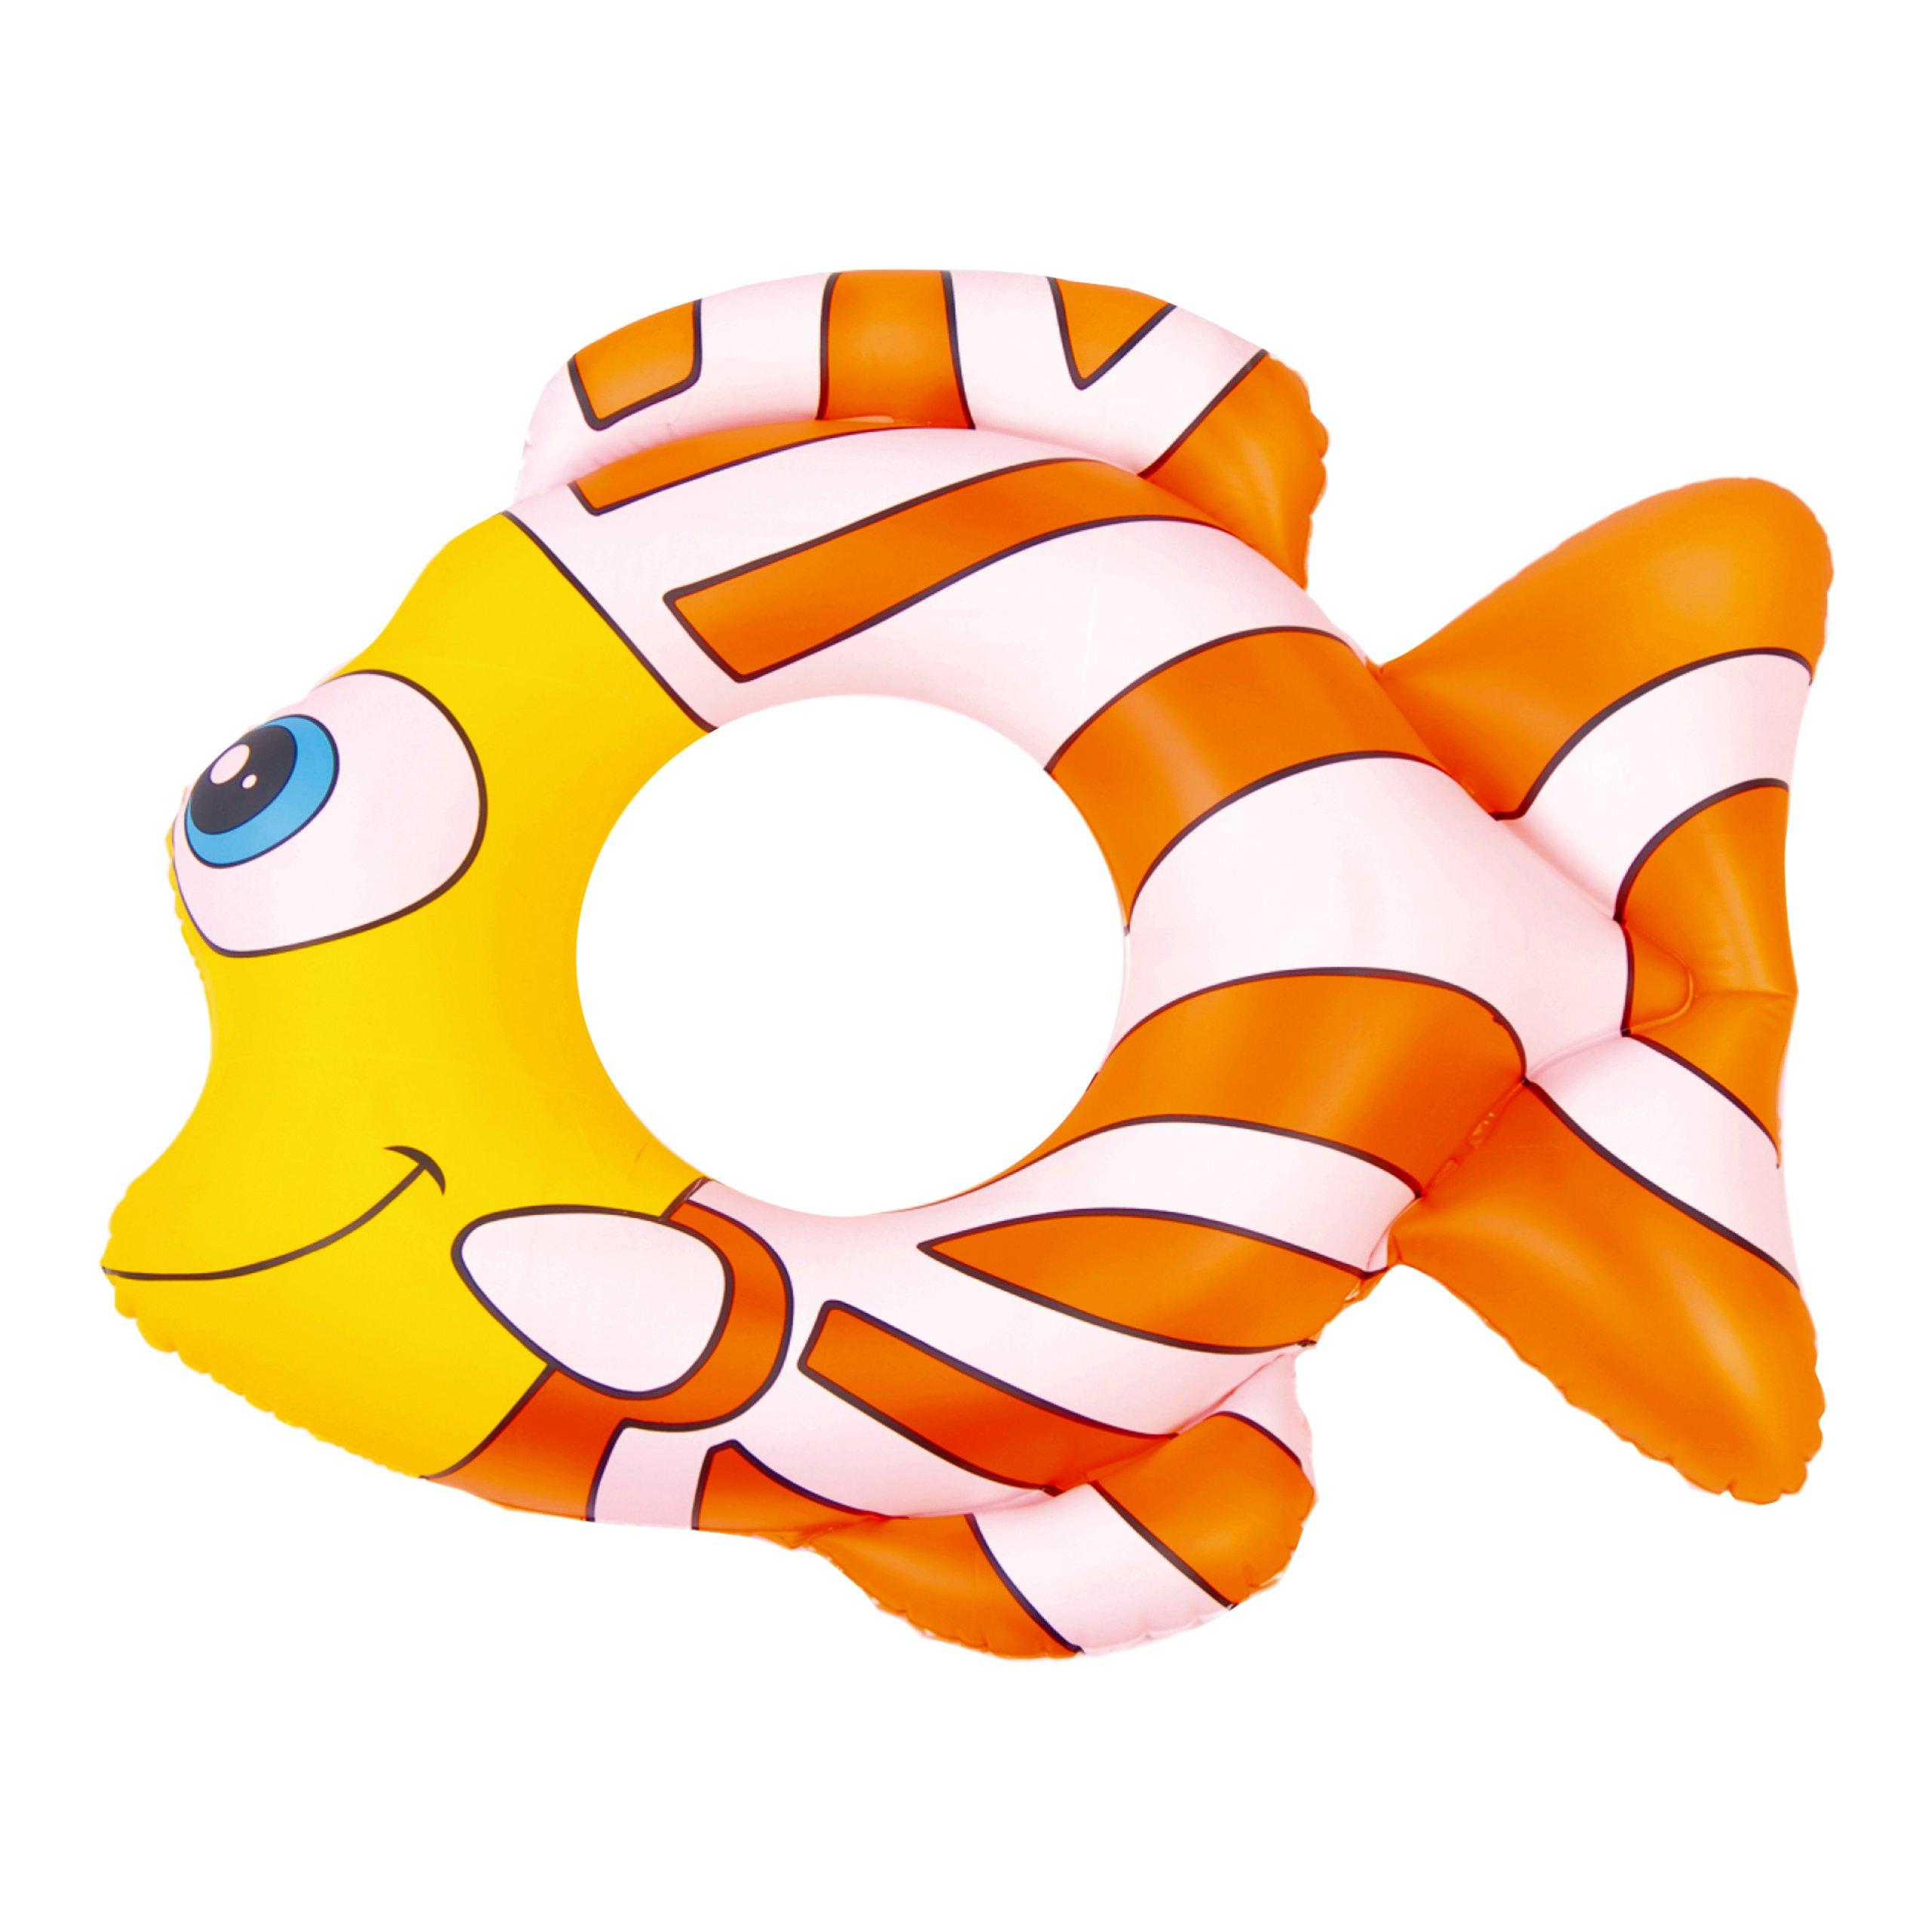 BADERING FISK -104878